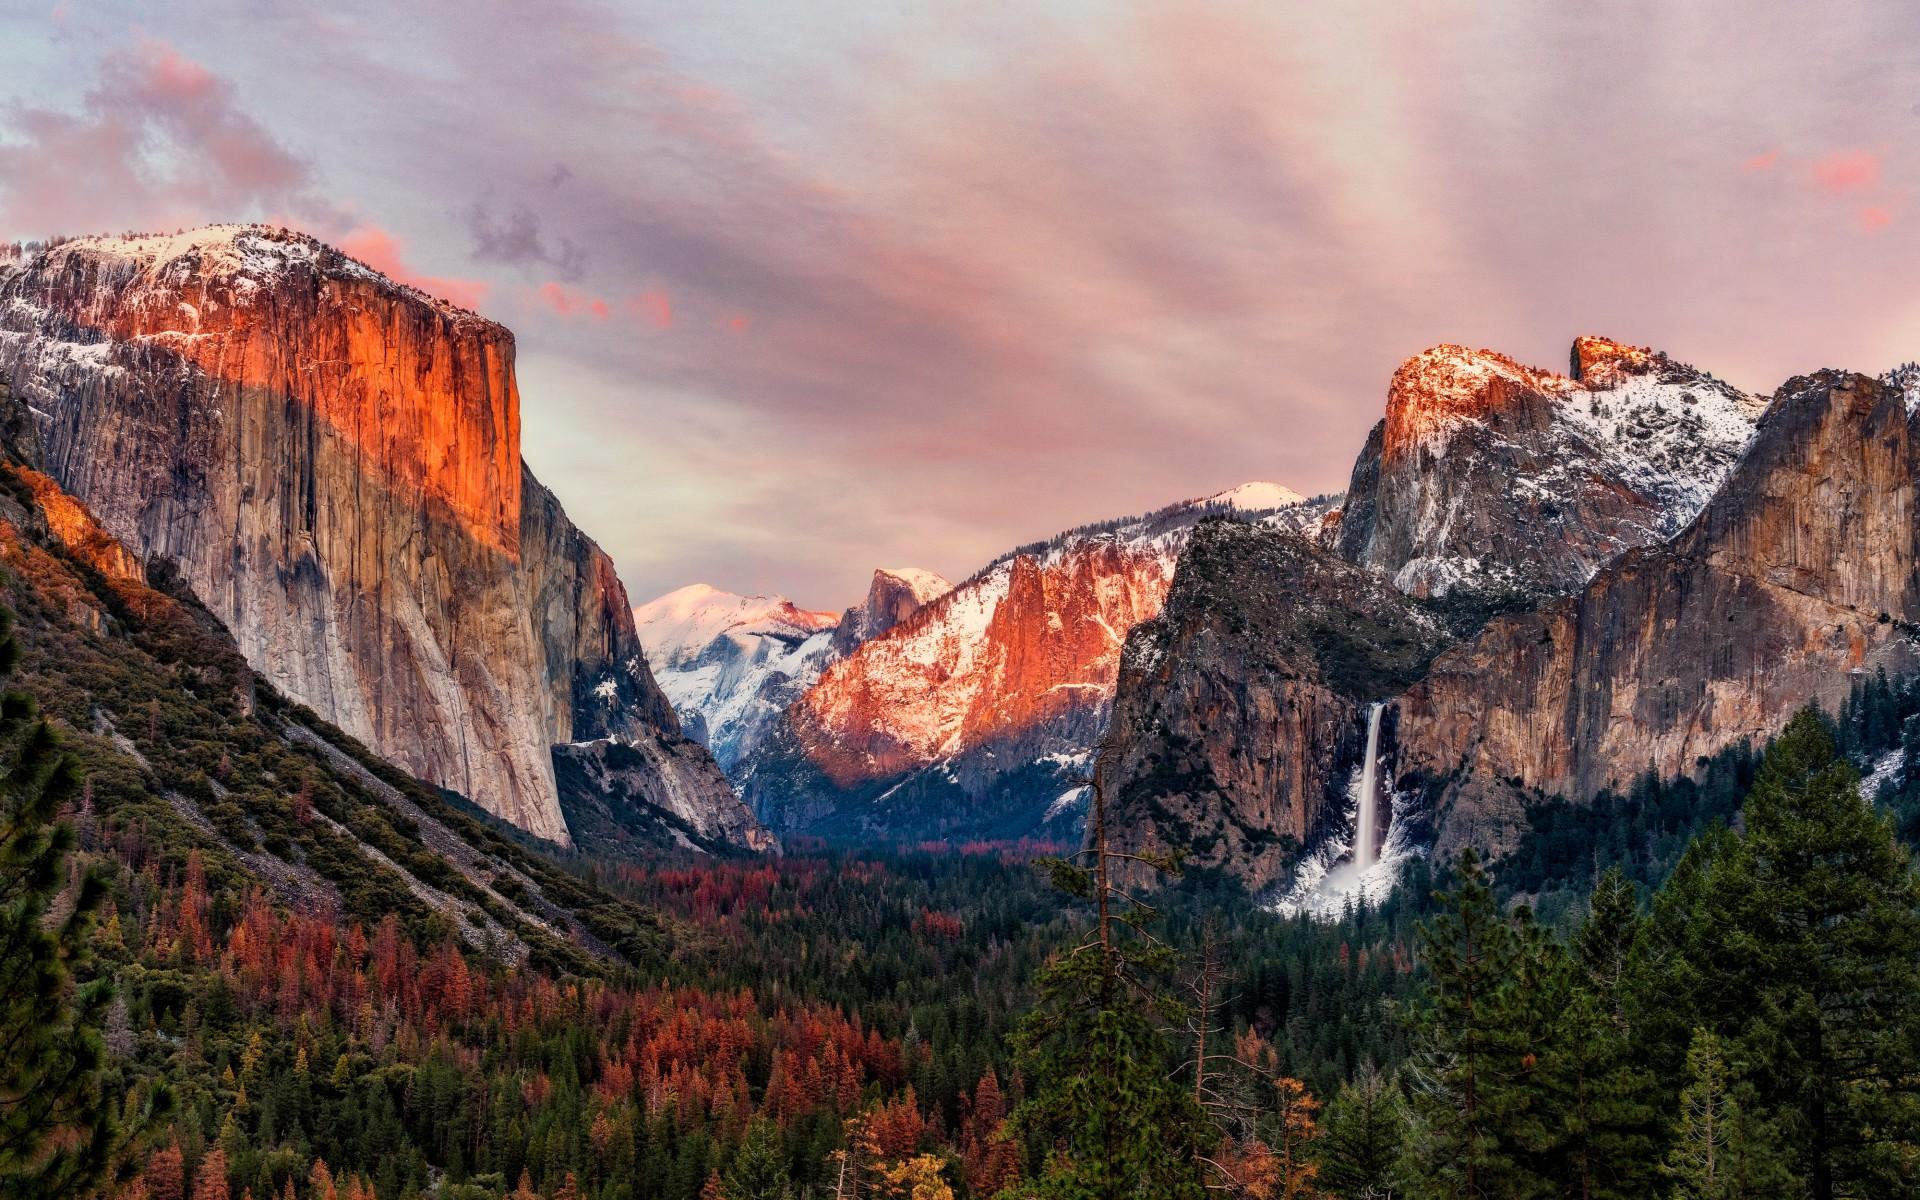 Space Wallpaper Iphone 4 El Capitan Yosemite Valley 4k Wallpapers Hd Wallpapers